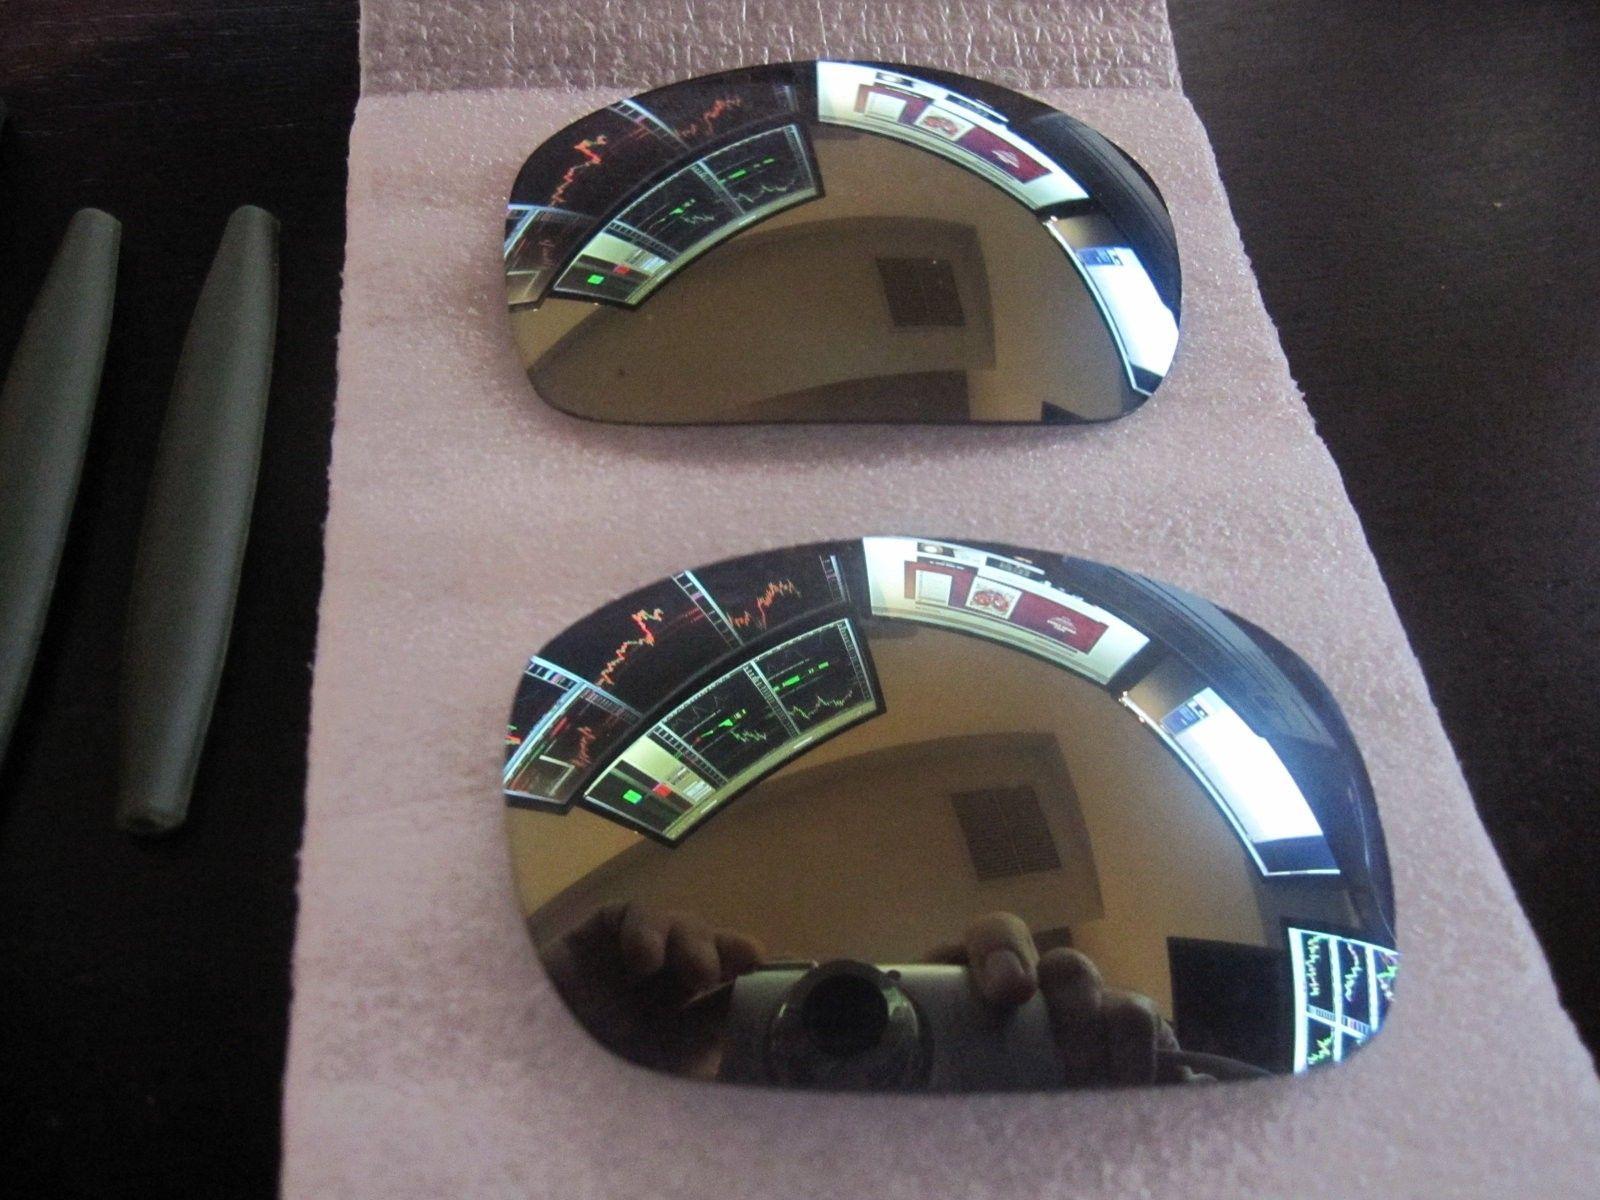 XS OEM Emerald lenses & LG olive rubbers - IMG_3729.JPG